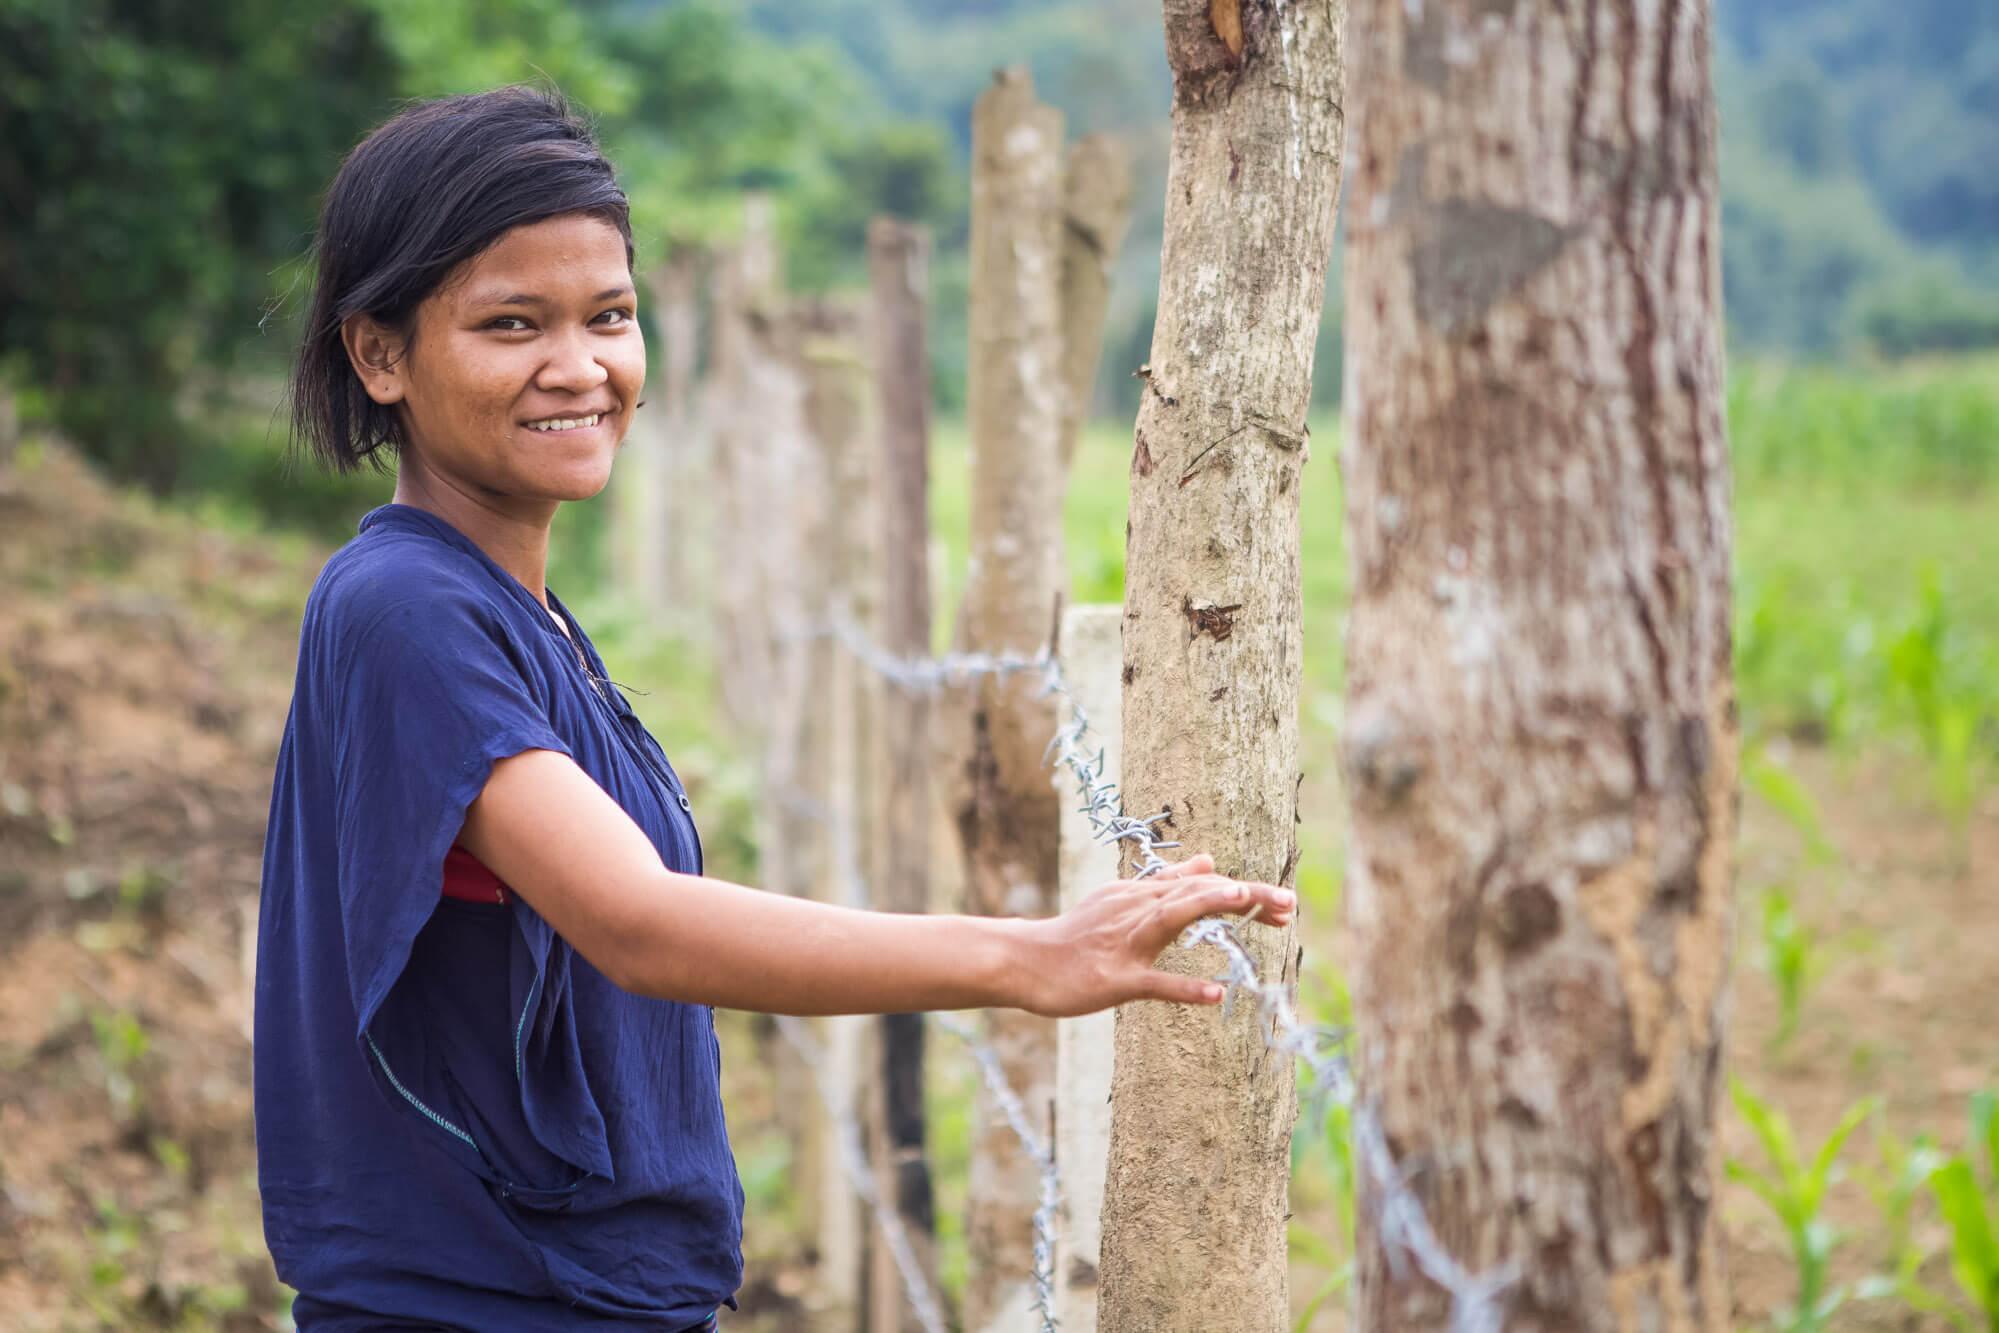 Oxfam, Vietnam, Quang Binh, land rights